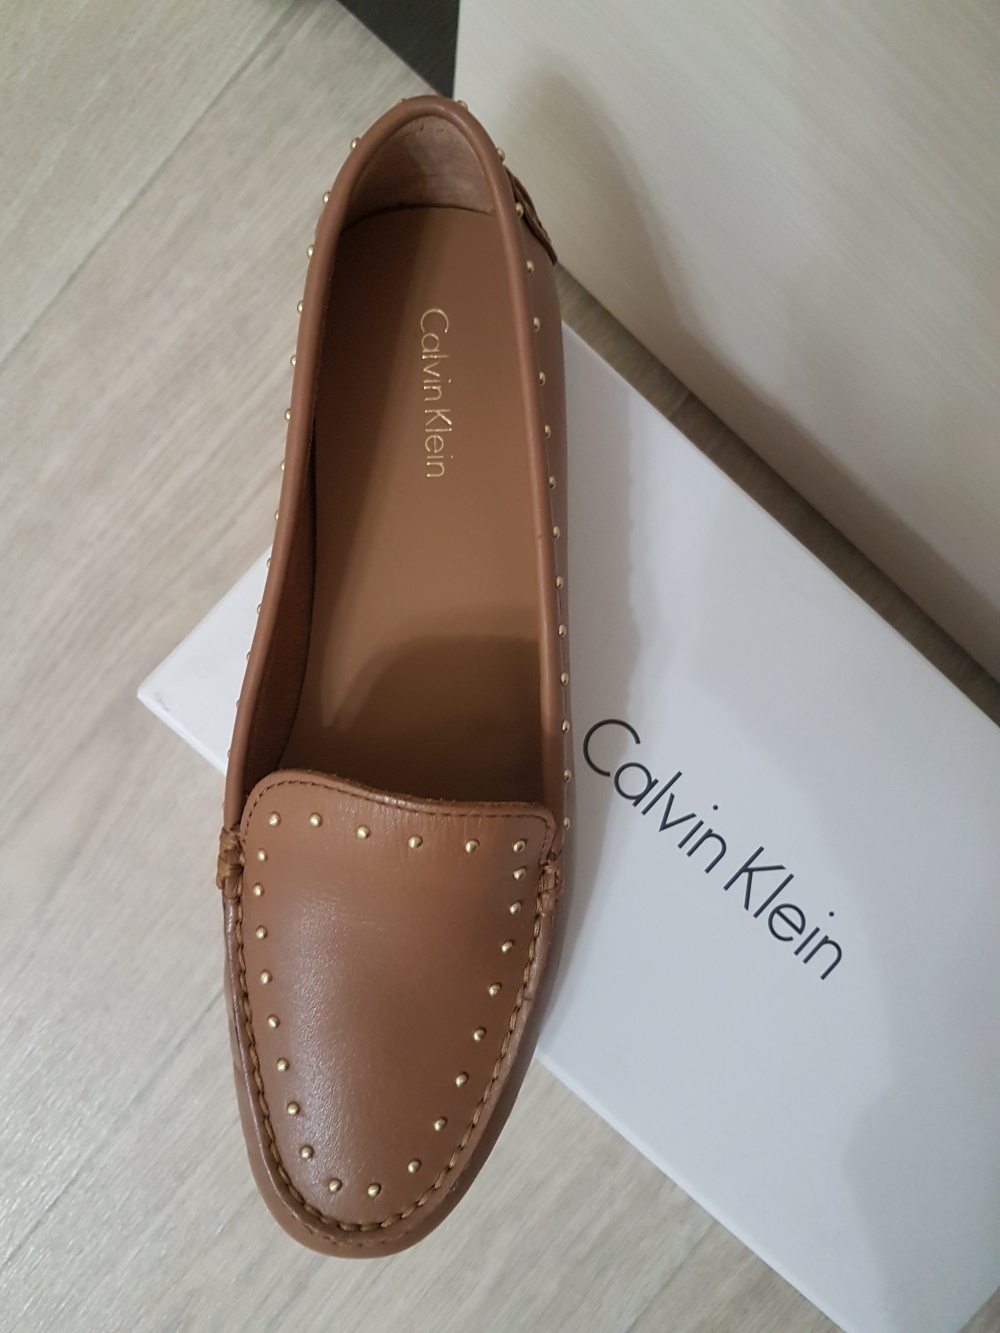 Кожаные мокасины Calvin Klein, размер 39 (8.5 US)